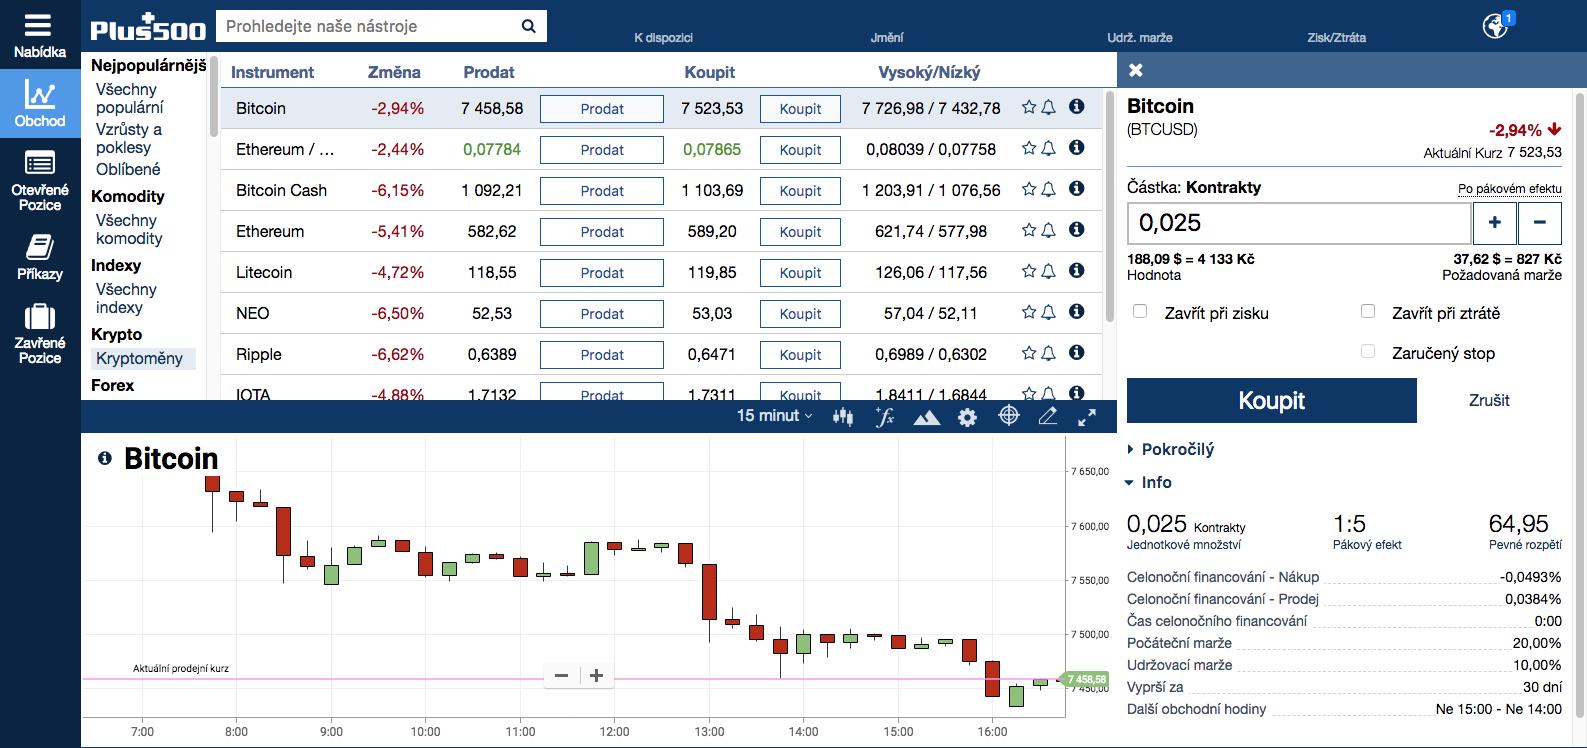 deposito bitcoin brokers forex